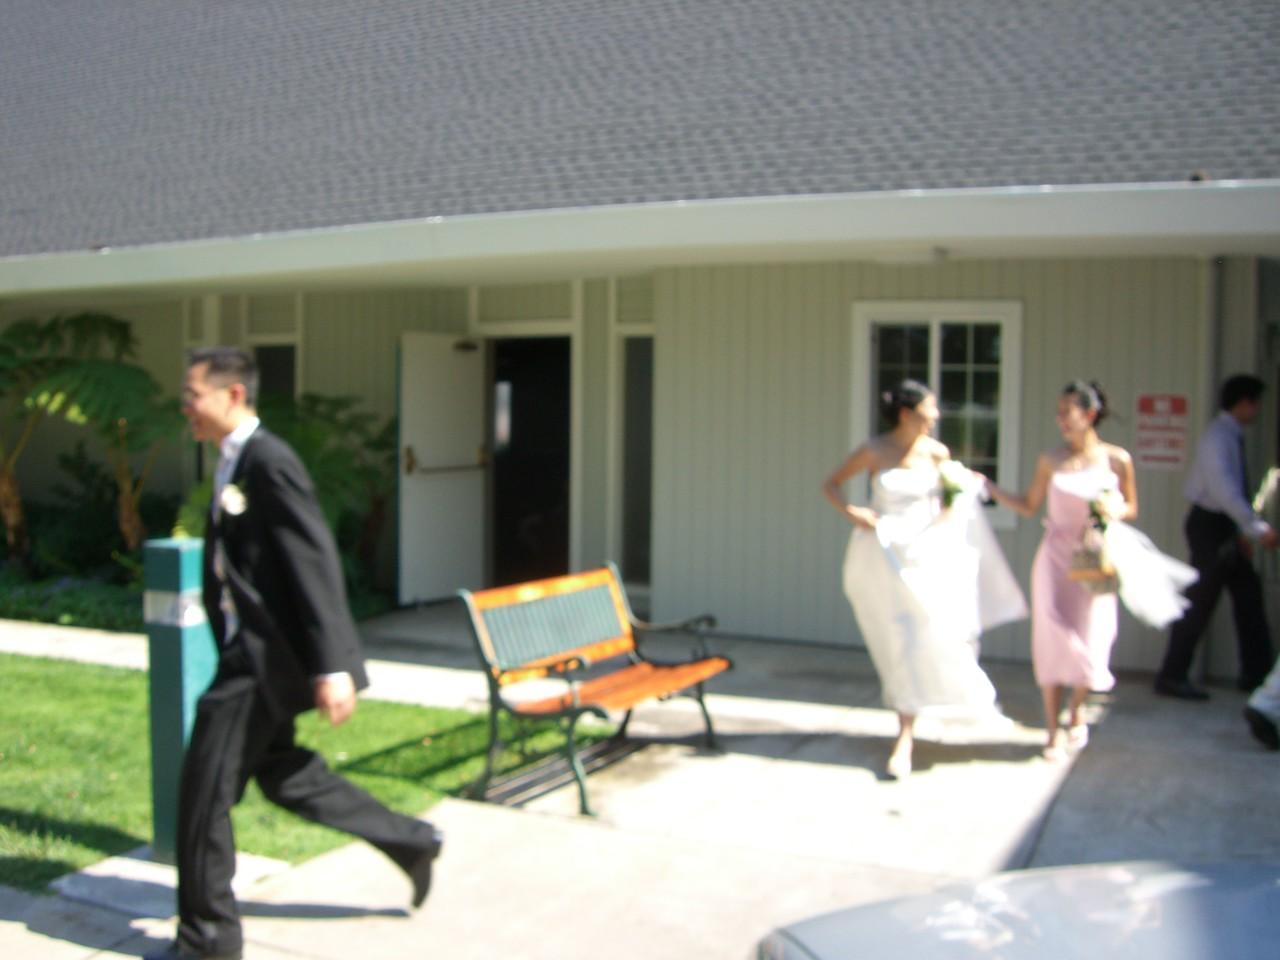 2006 06 24 Sat - Bride & Bridesmaid running after Groom